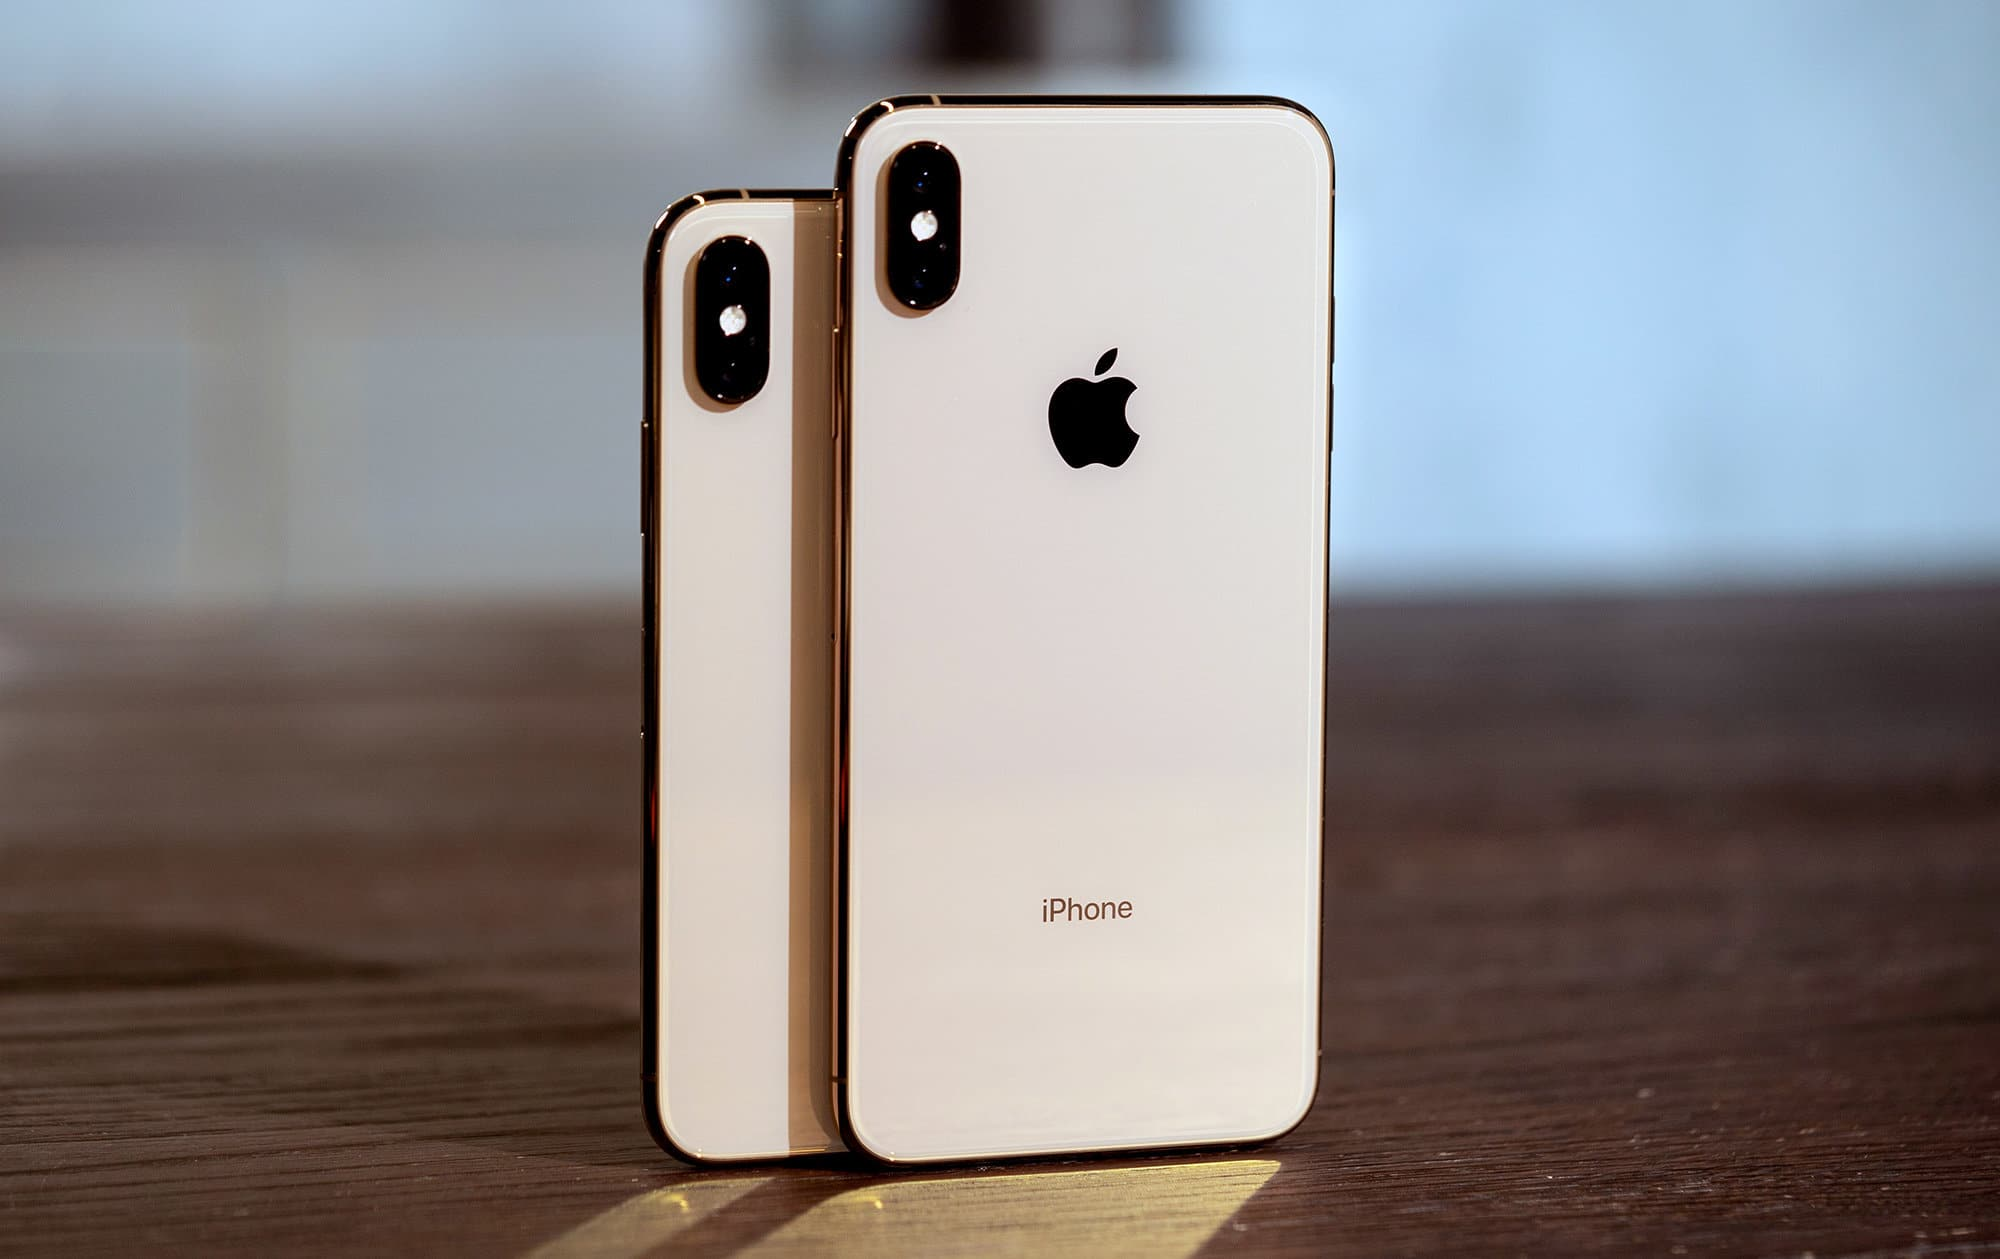 Iphone Slowdown?